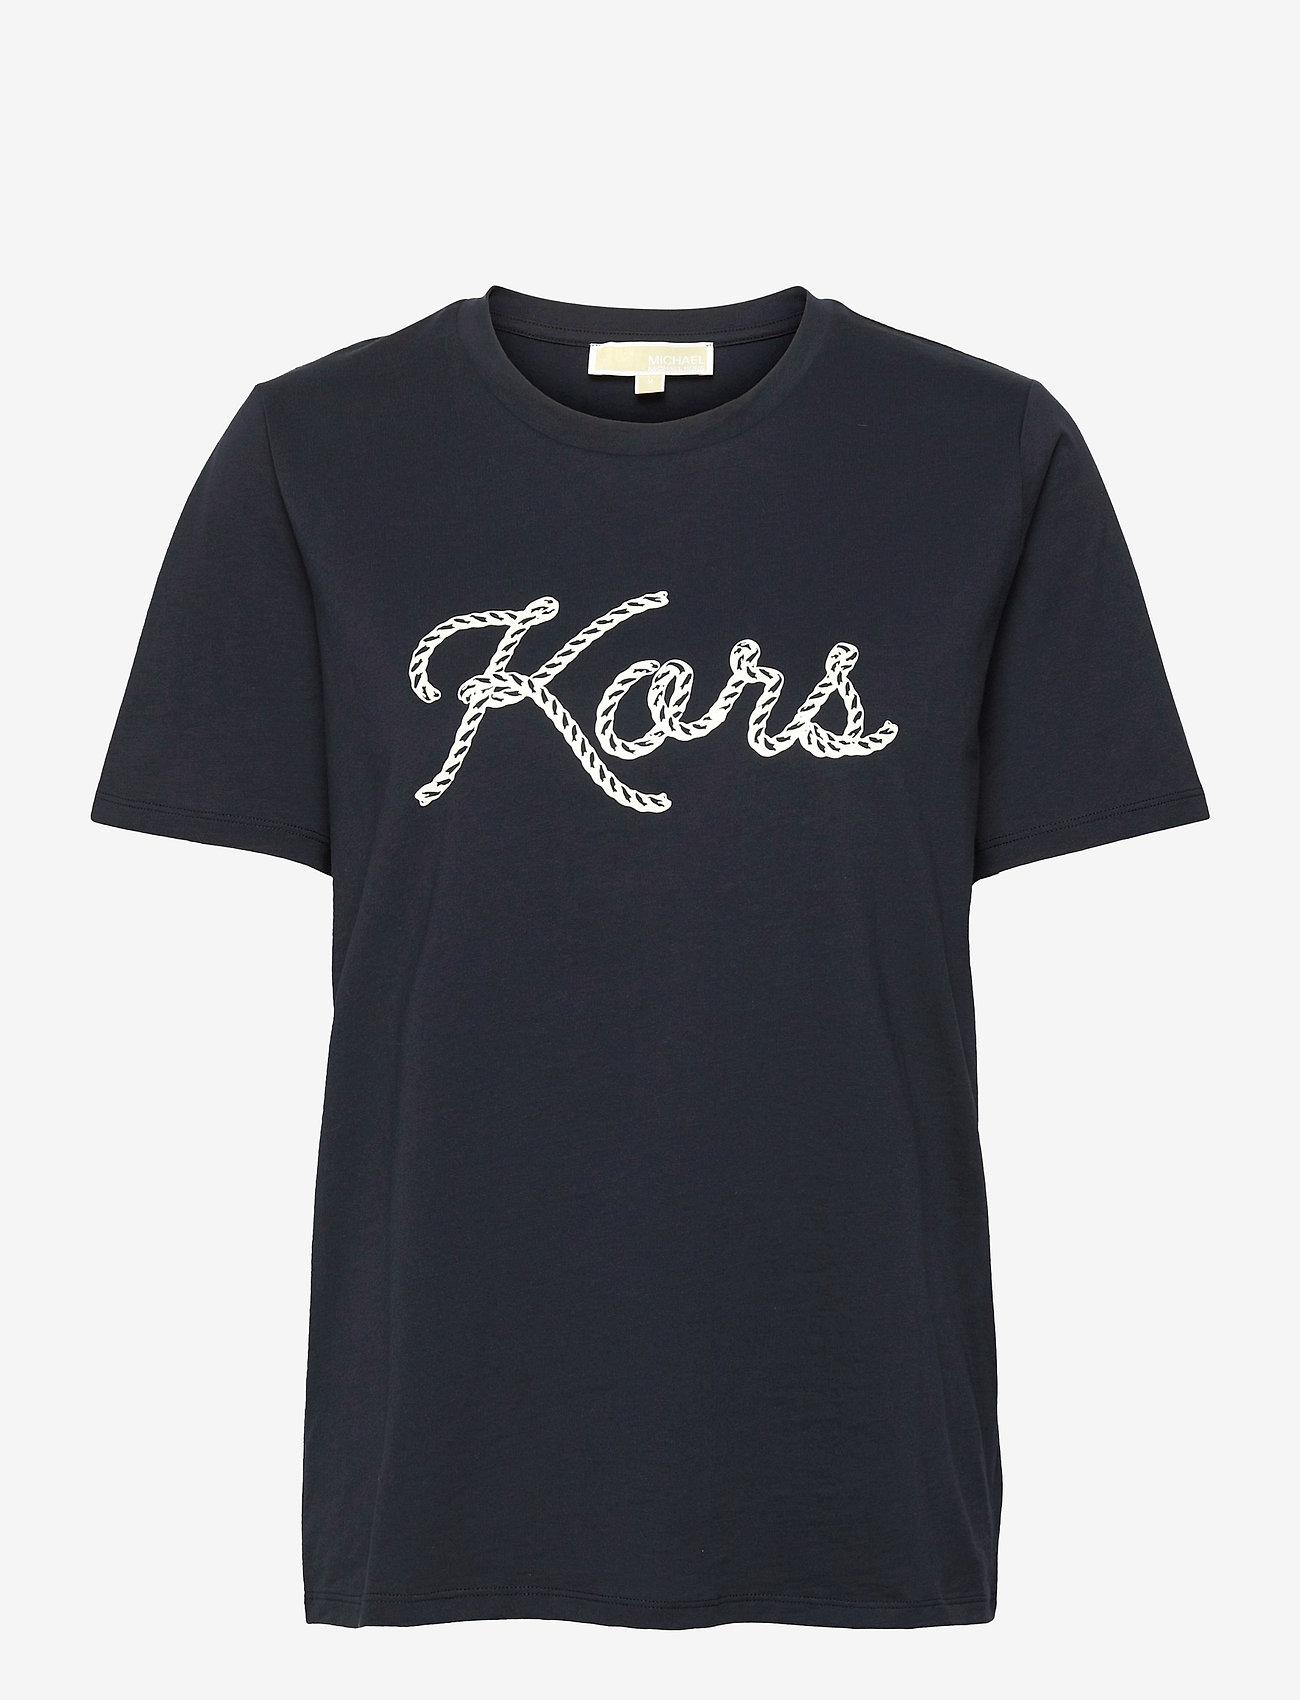 Michael Kors - KORS ROPE GRAPHIC TSHIRT - t-shirts - midnightblue - 0